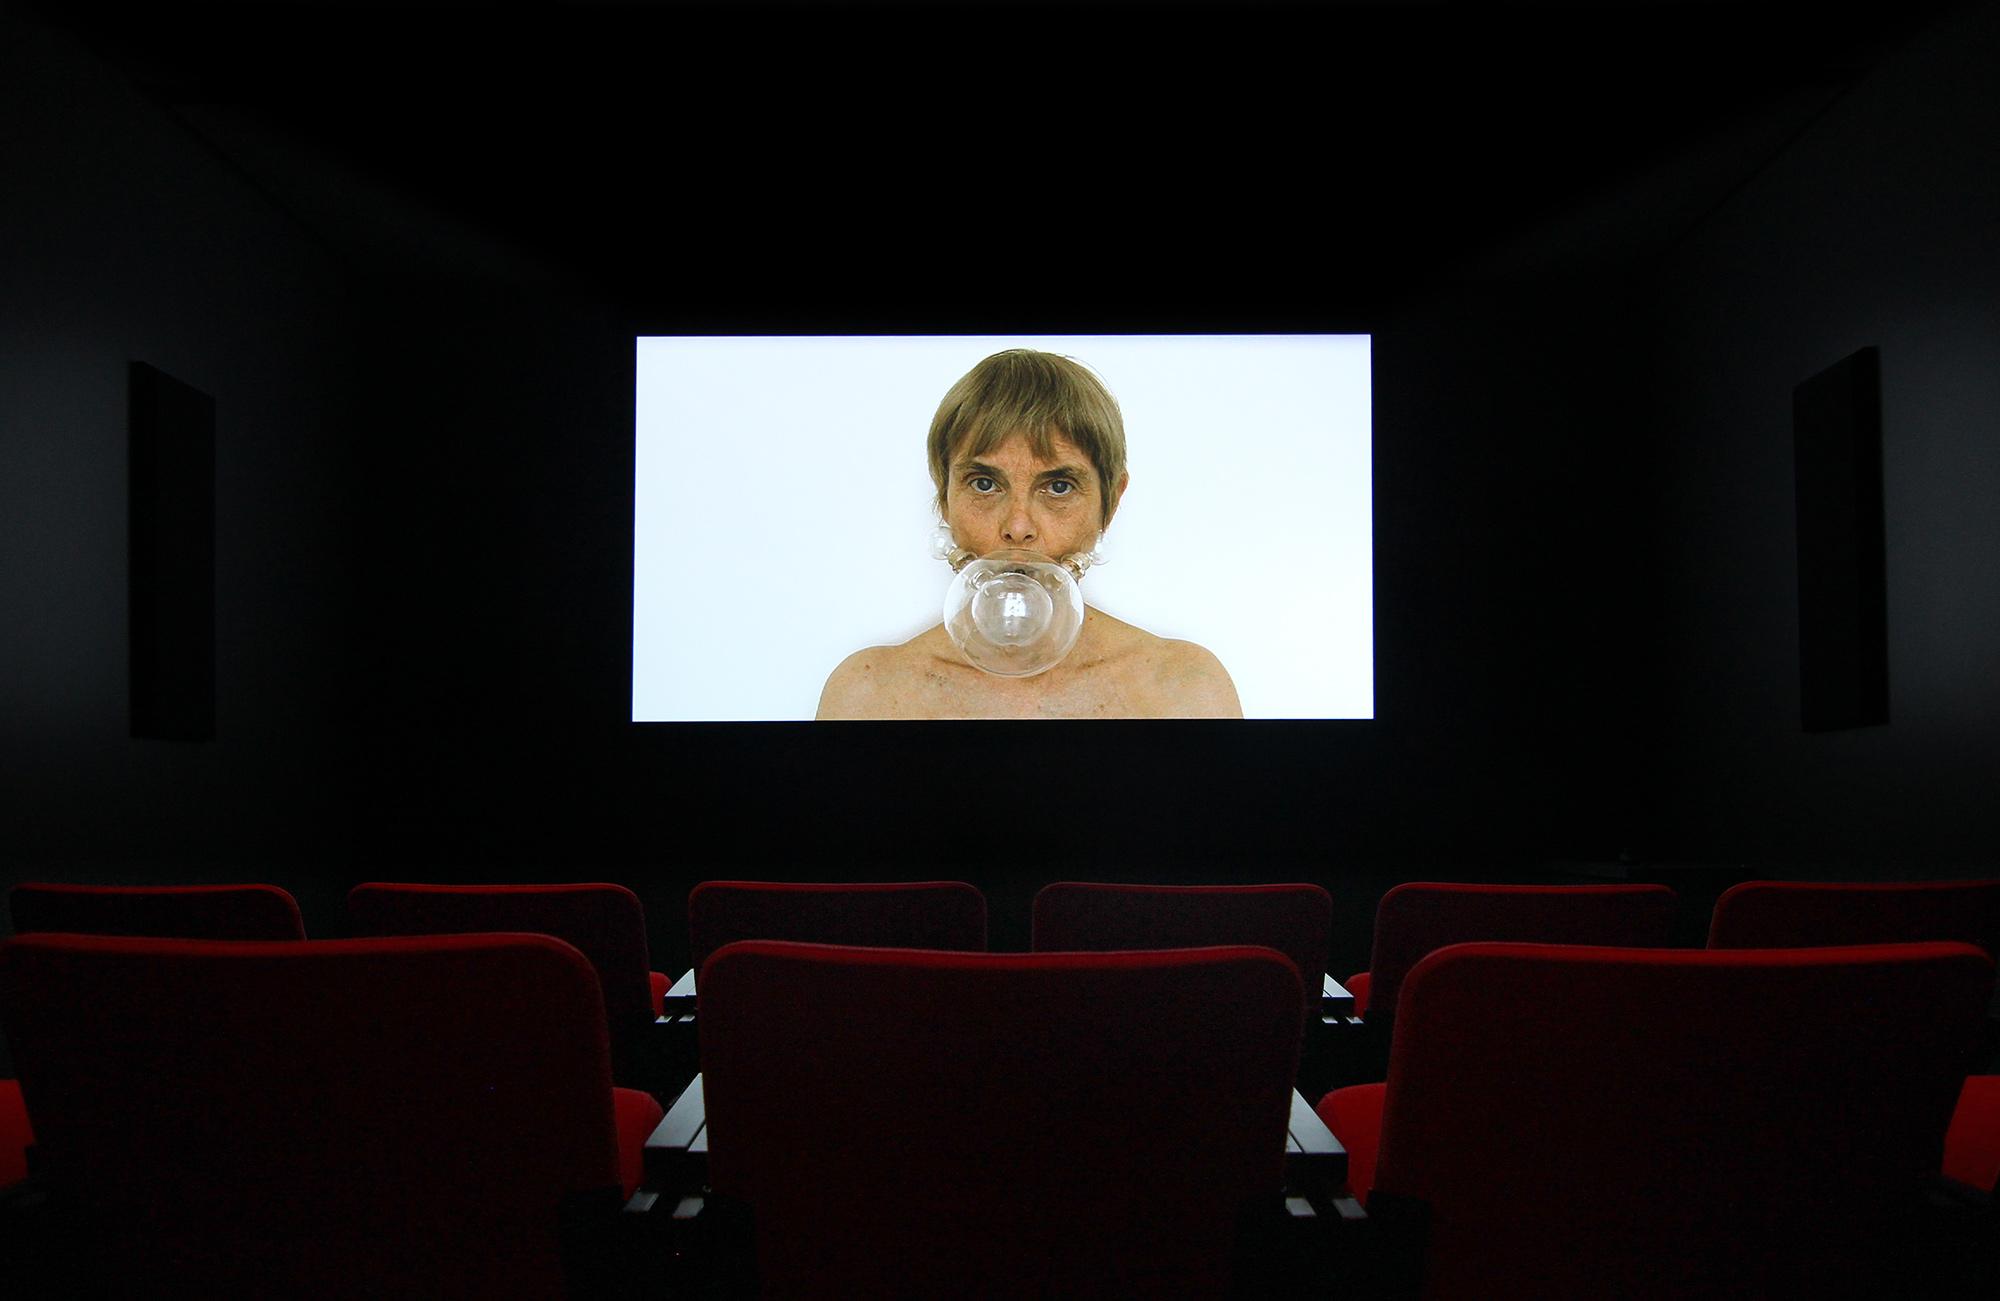 © Chantal duPont, Visages (2013). Exhibition view. Photo: Veronica Mockler.